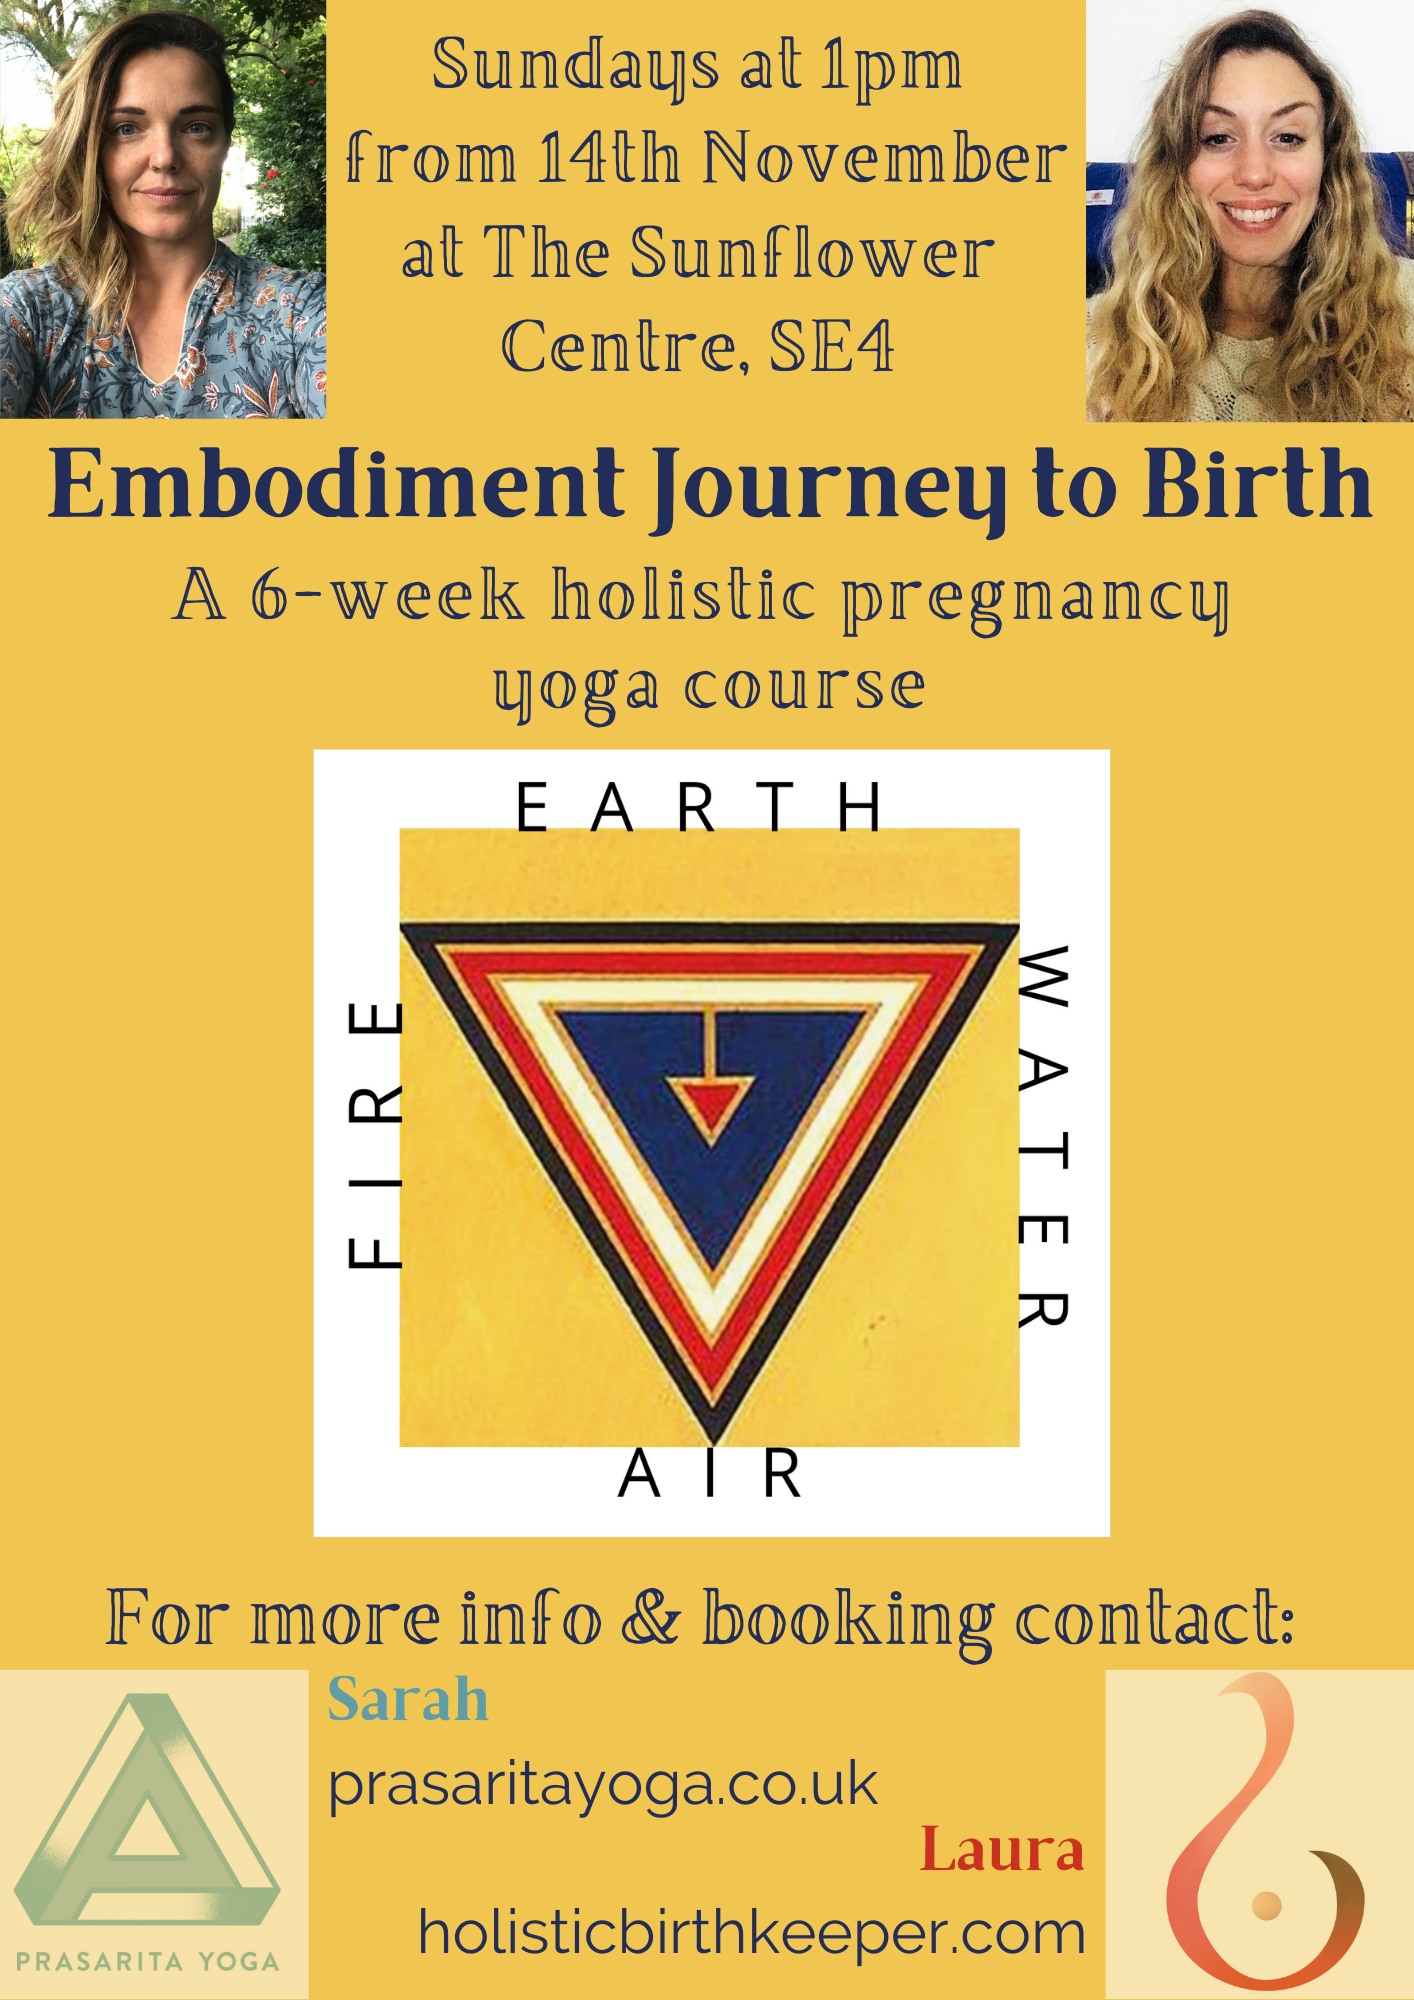 Embodiment Journey to Birth